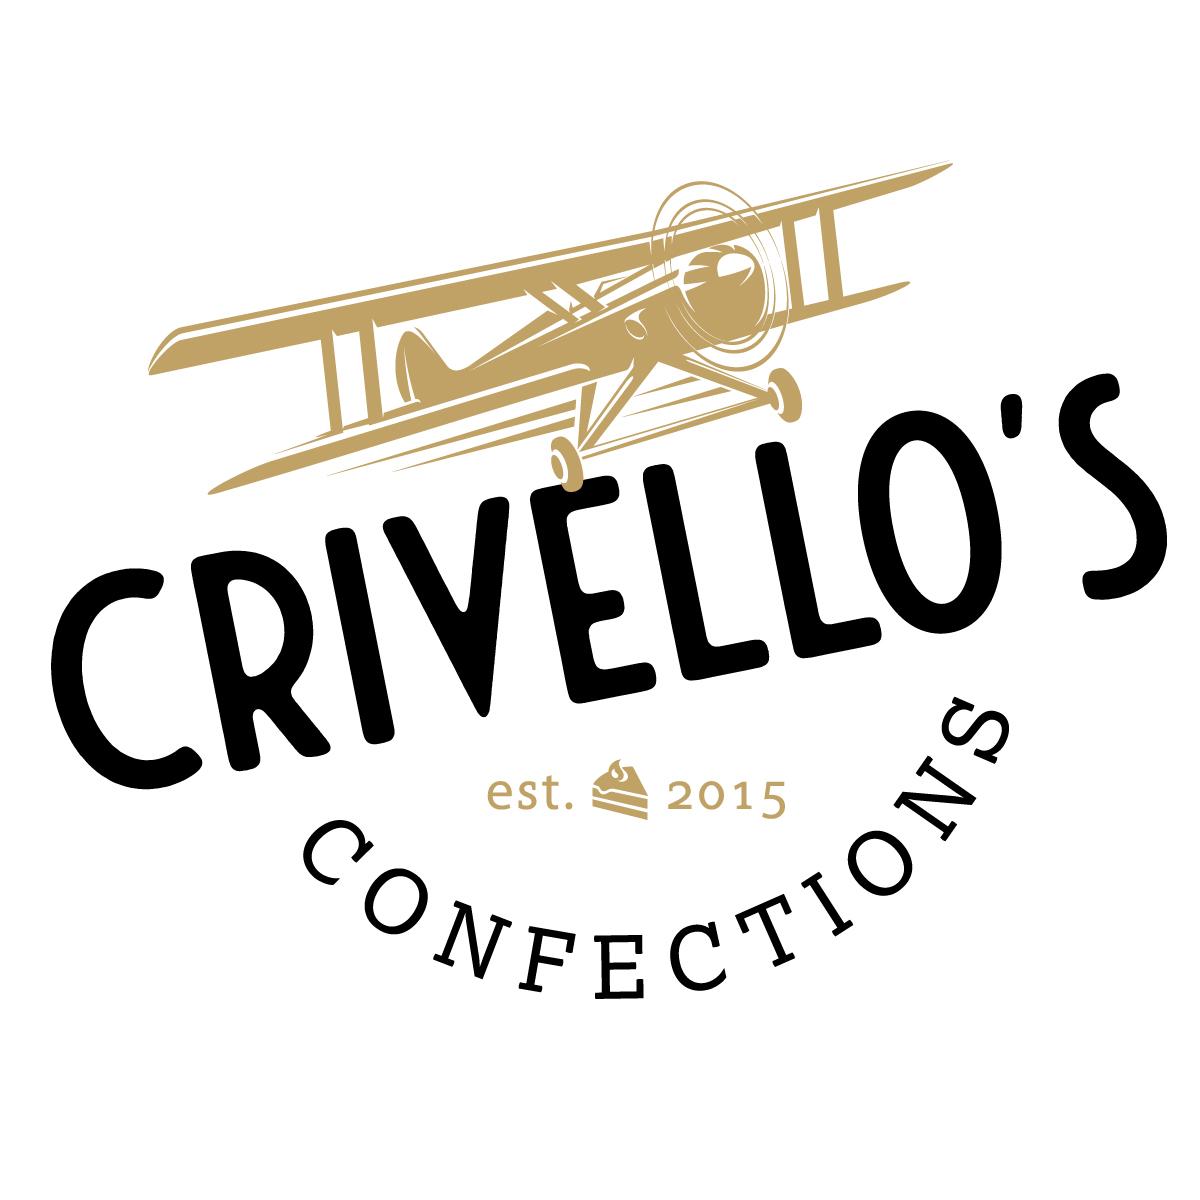 Crivellos-Logo-Main-01.jpg